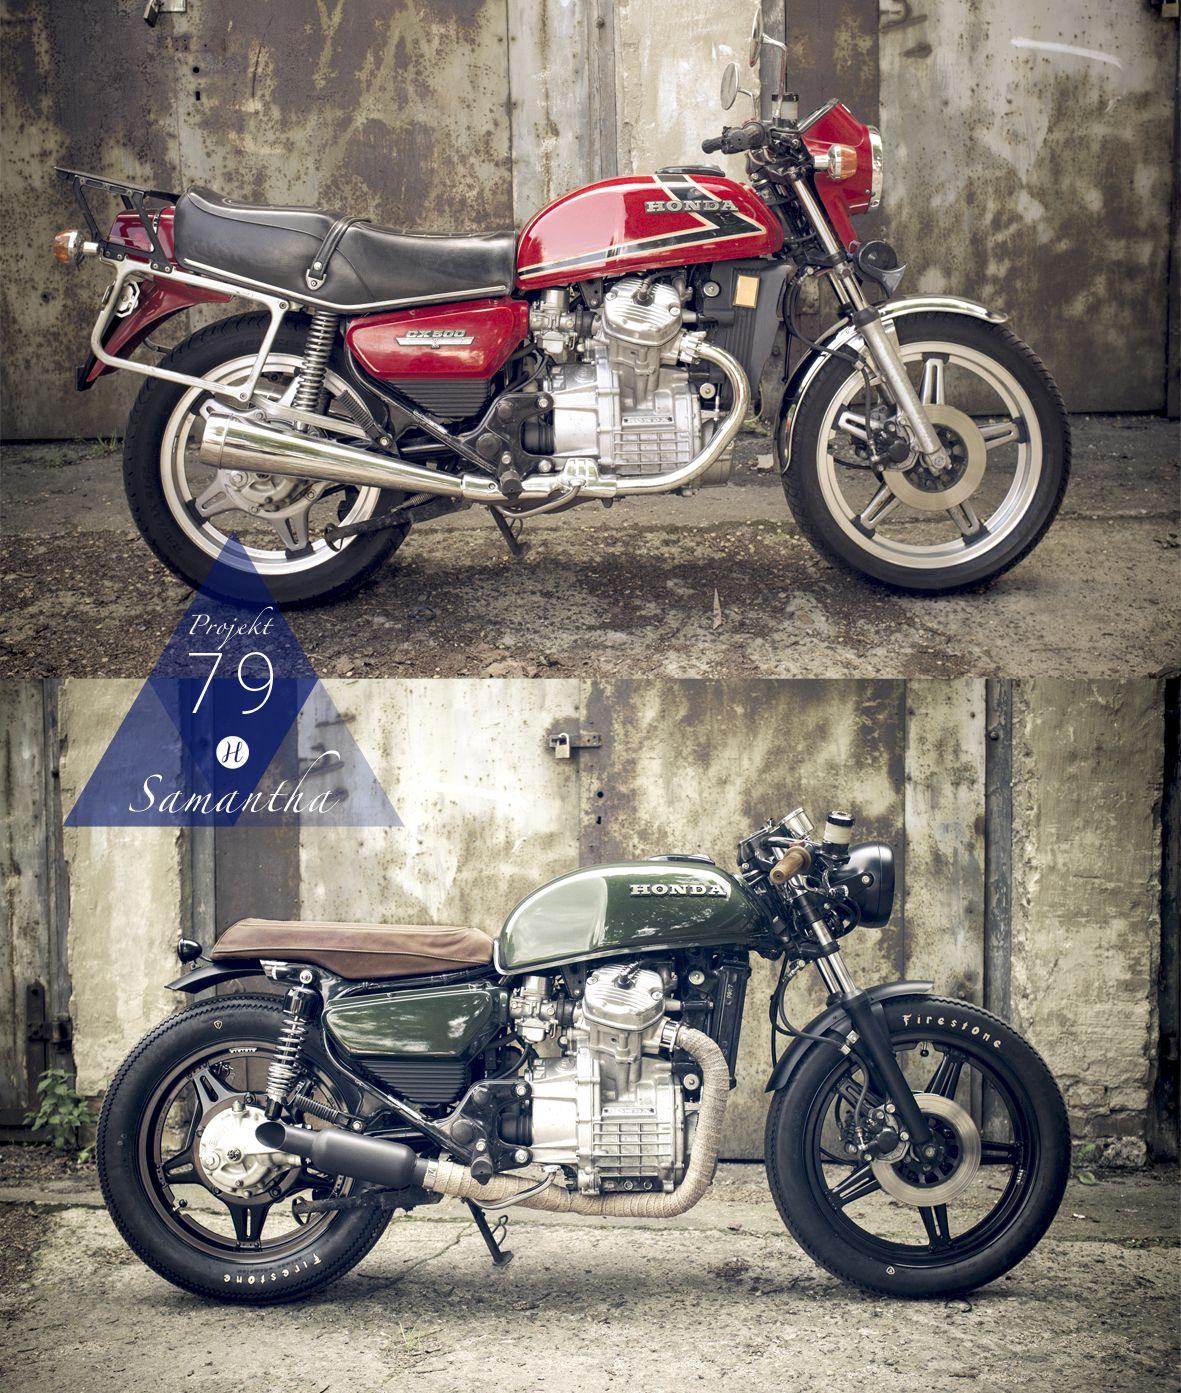 Honda Cx500 Cafe Exhaust: Cafe Racer Honda, Cafe Racer Bikes, Honda